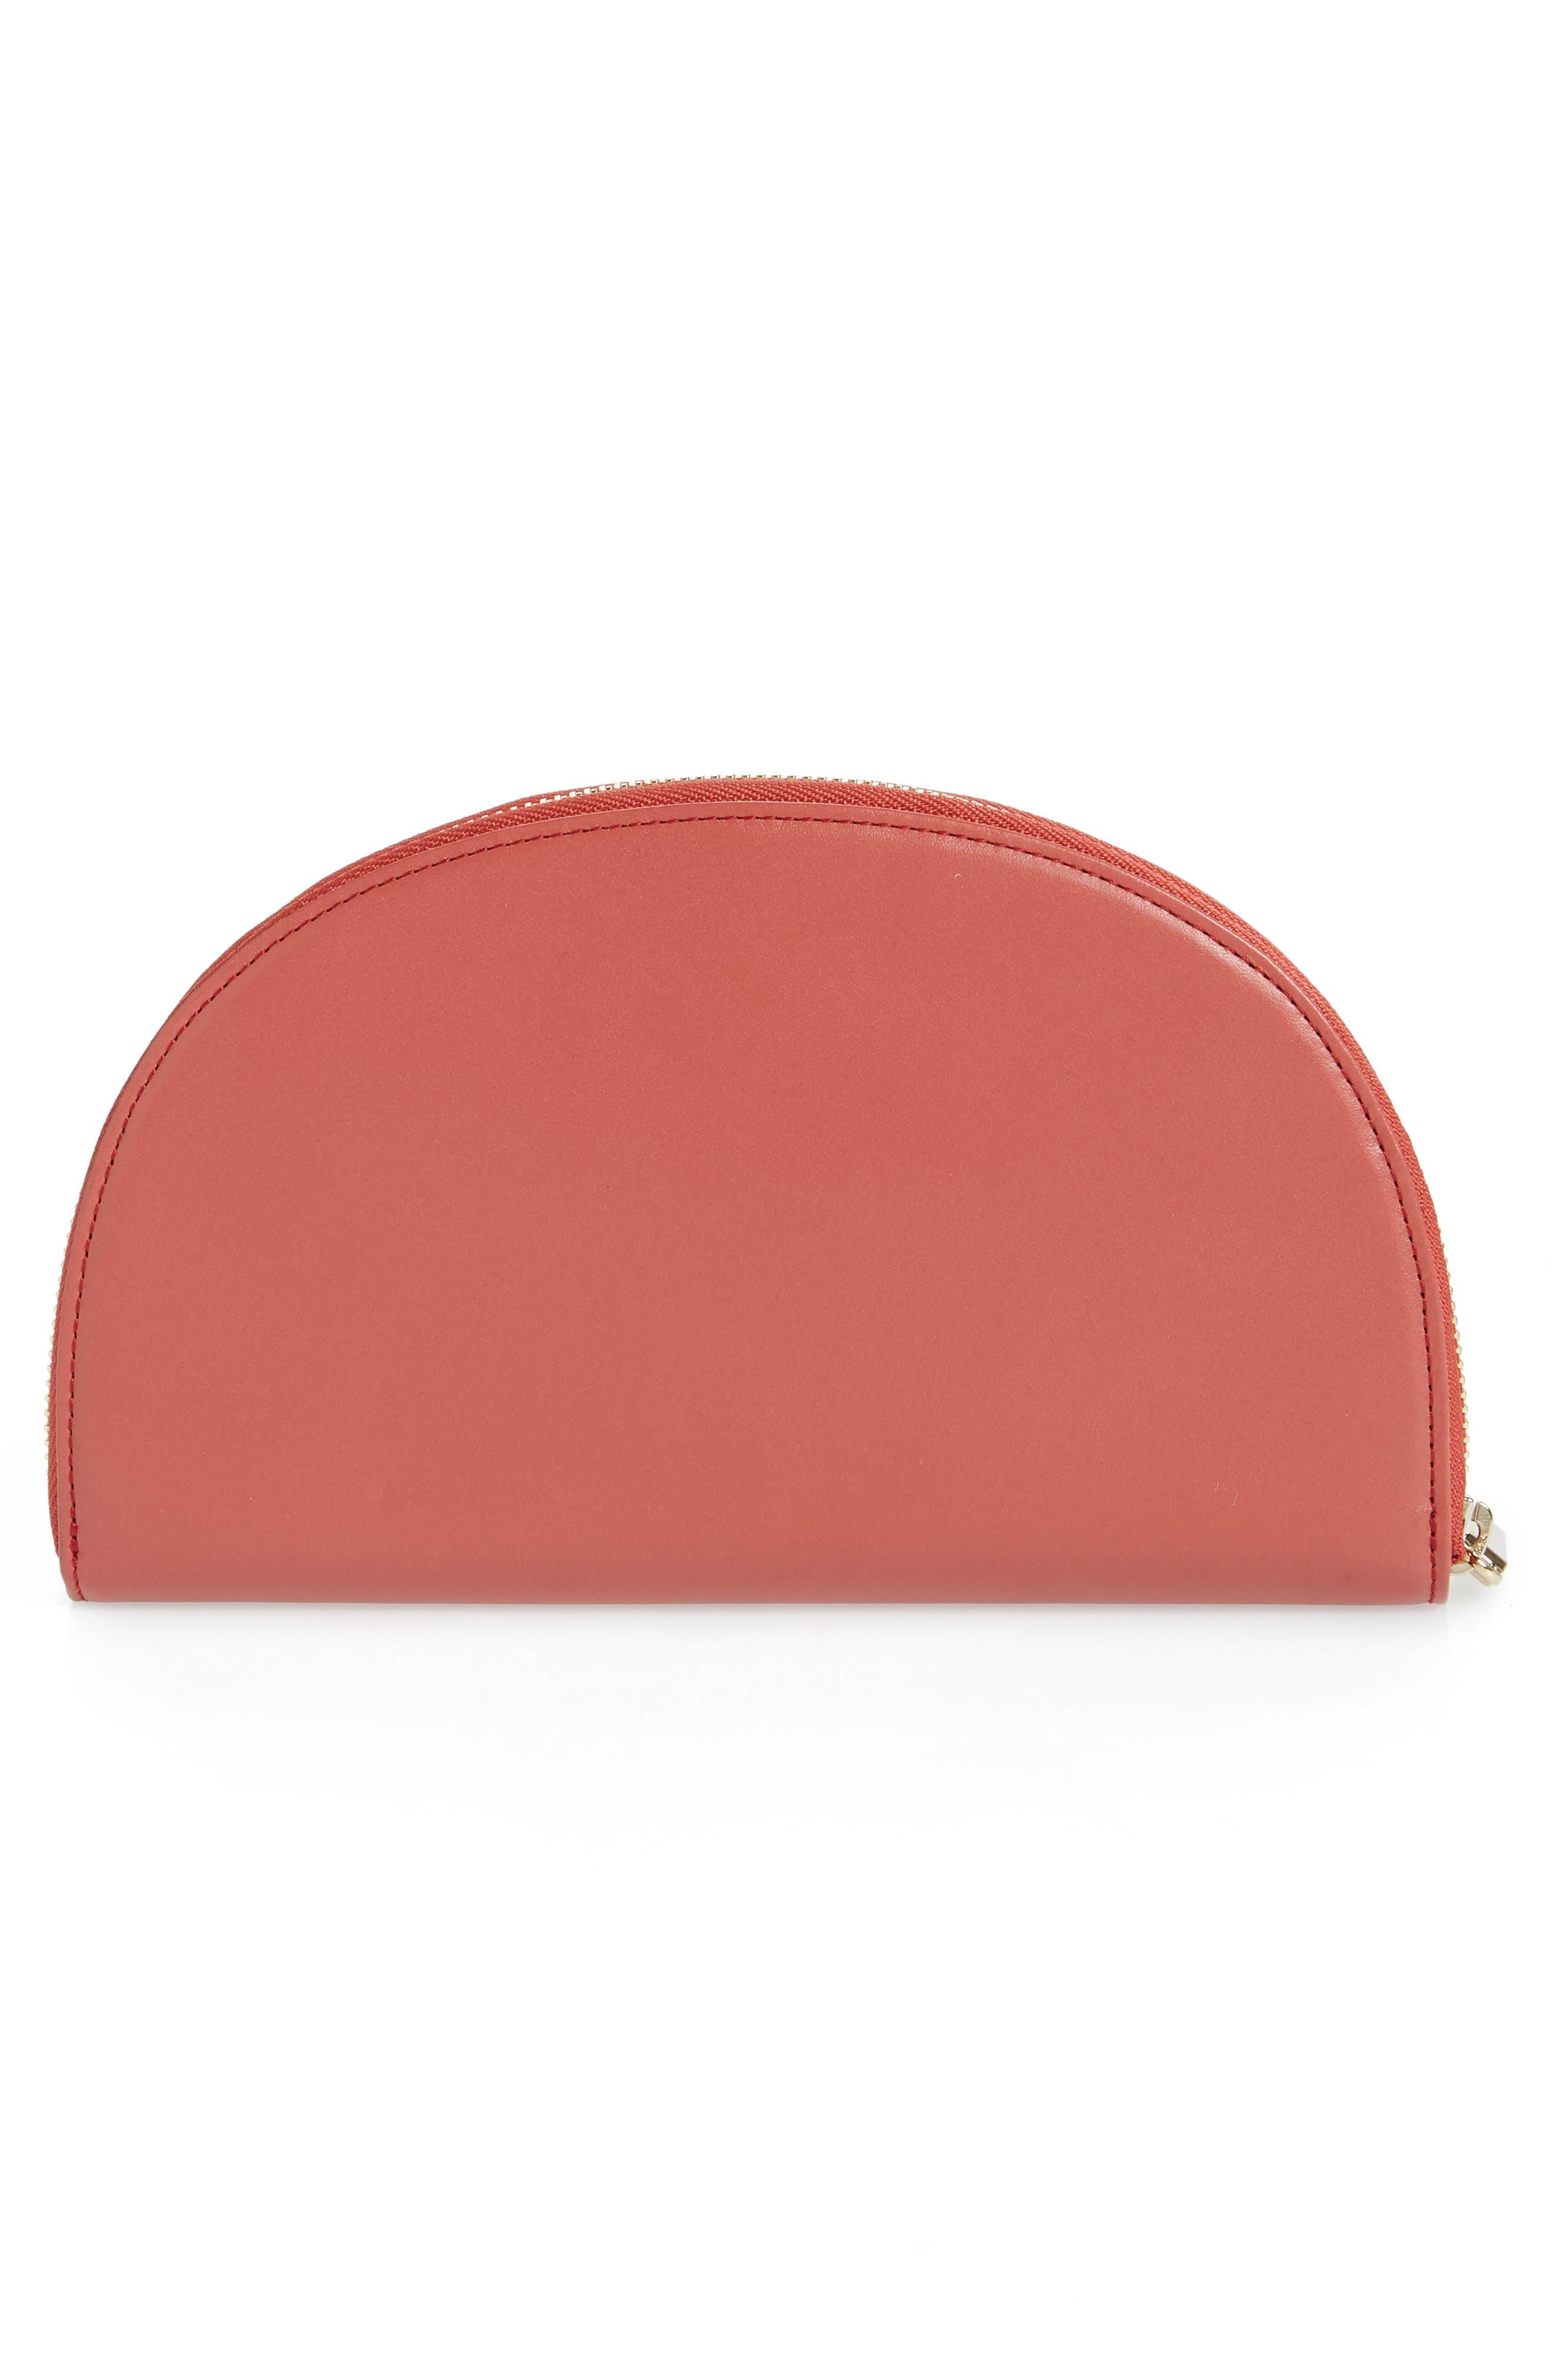 Dia Continental Mirror Wallet,                             Alternate thumbnail 3, color,                             ROSE WOOD